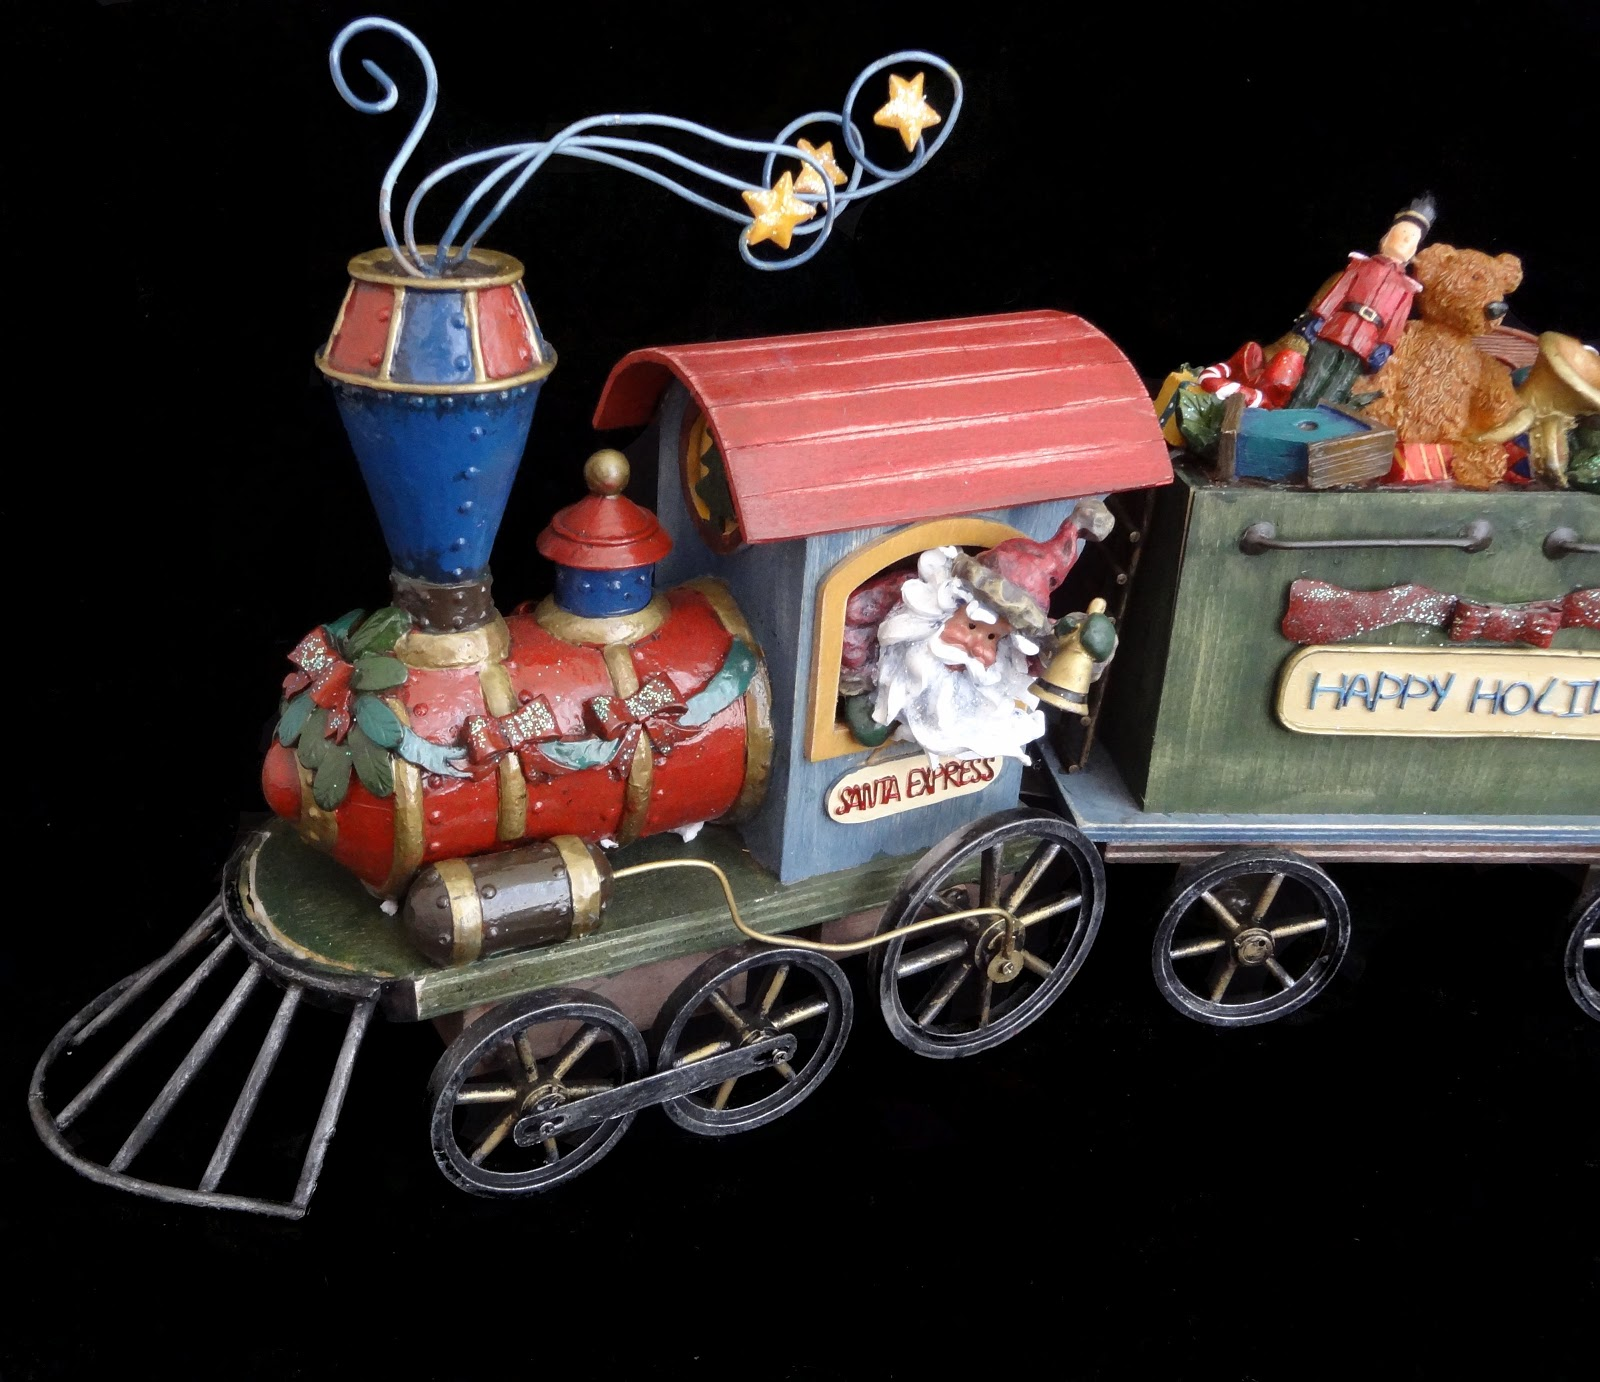 http://3.bp.blogspot.com/-SAzZqHpef4A/UIsUzmvifnI/AAAAAAAAAWI/DPm8aOq_QNk/s1600/Santa+Express+Train.JPG